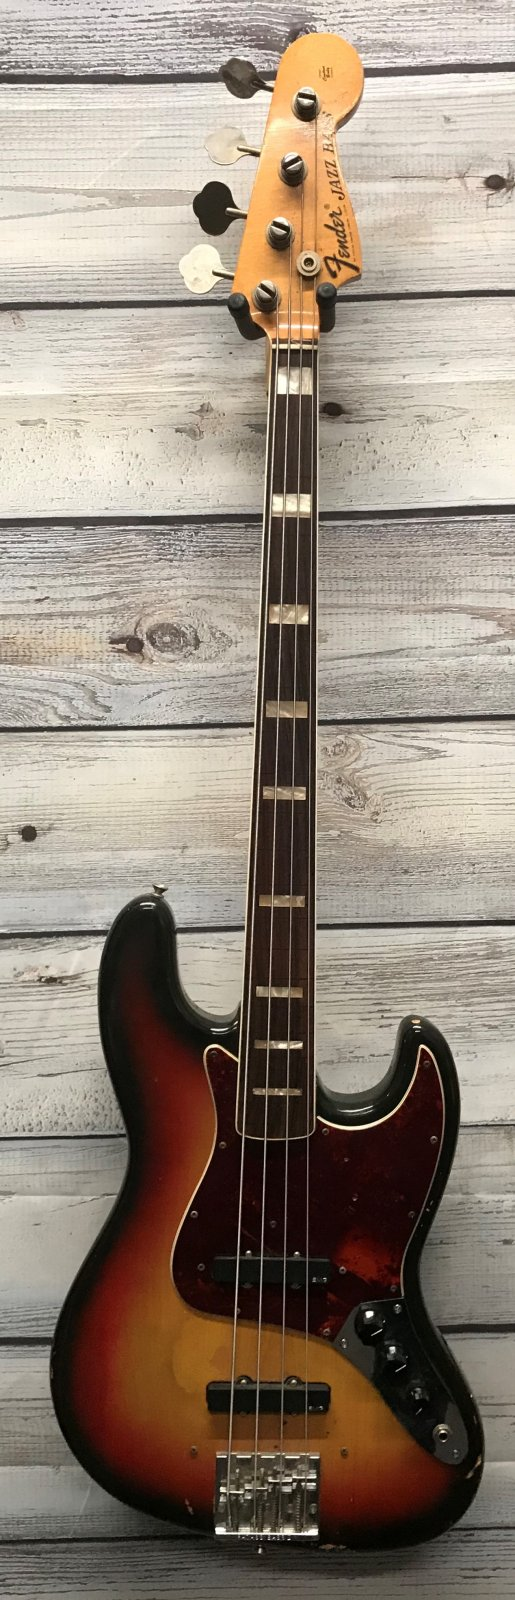 Used 1971 Fender Jazz Bass Fretless